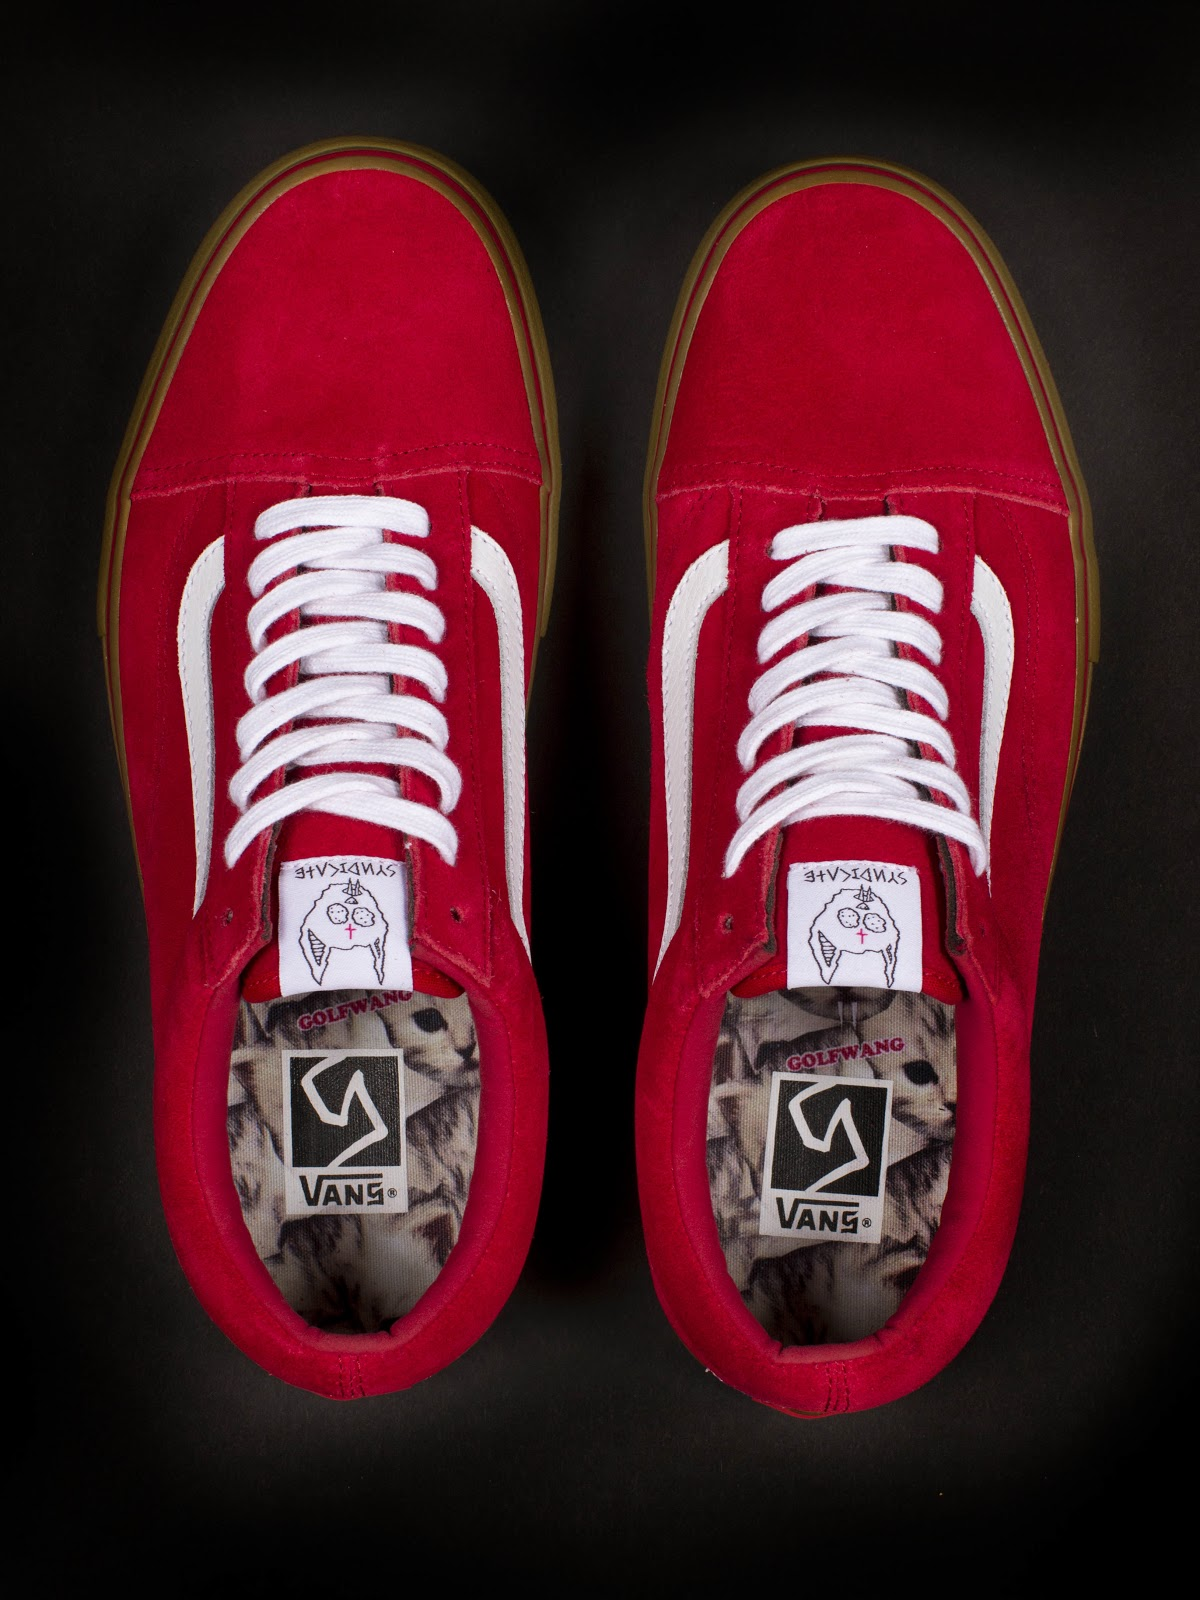 vans old skool pro s red